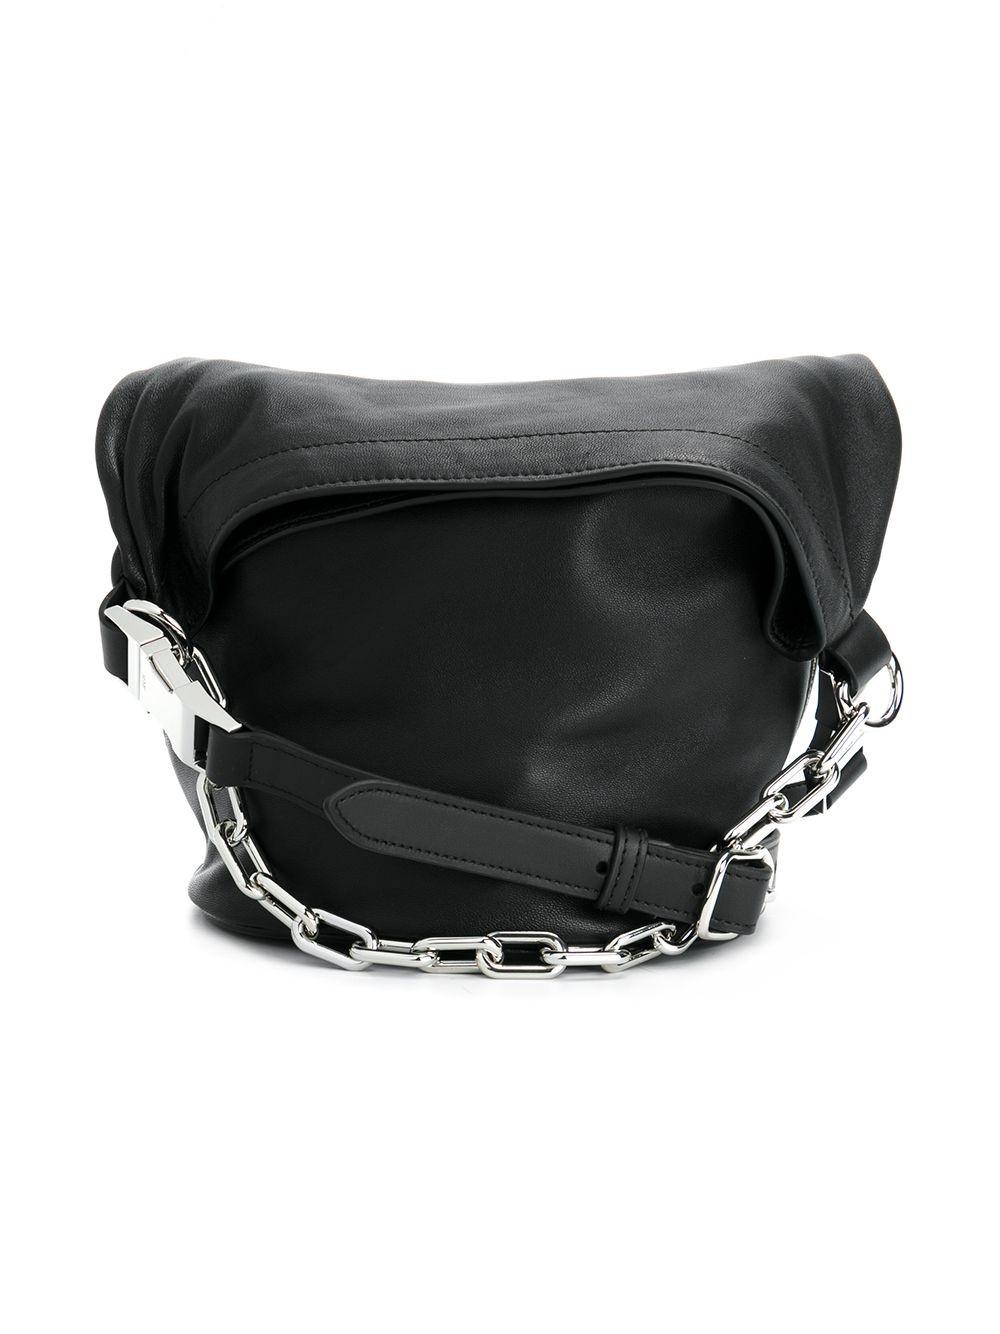 3fbe9f1ff7e6 alexander wang ATTICA BUCKET BAG available on montiboutique.com - 28882